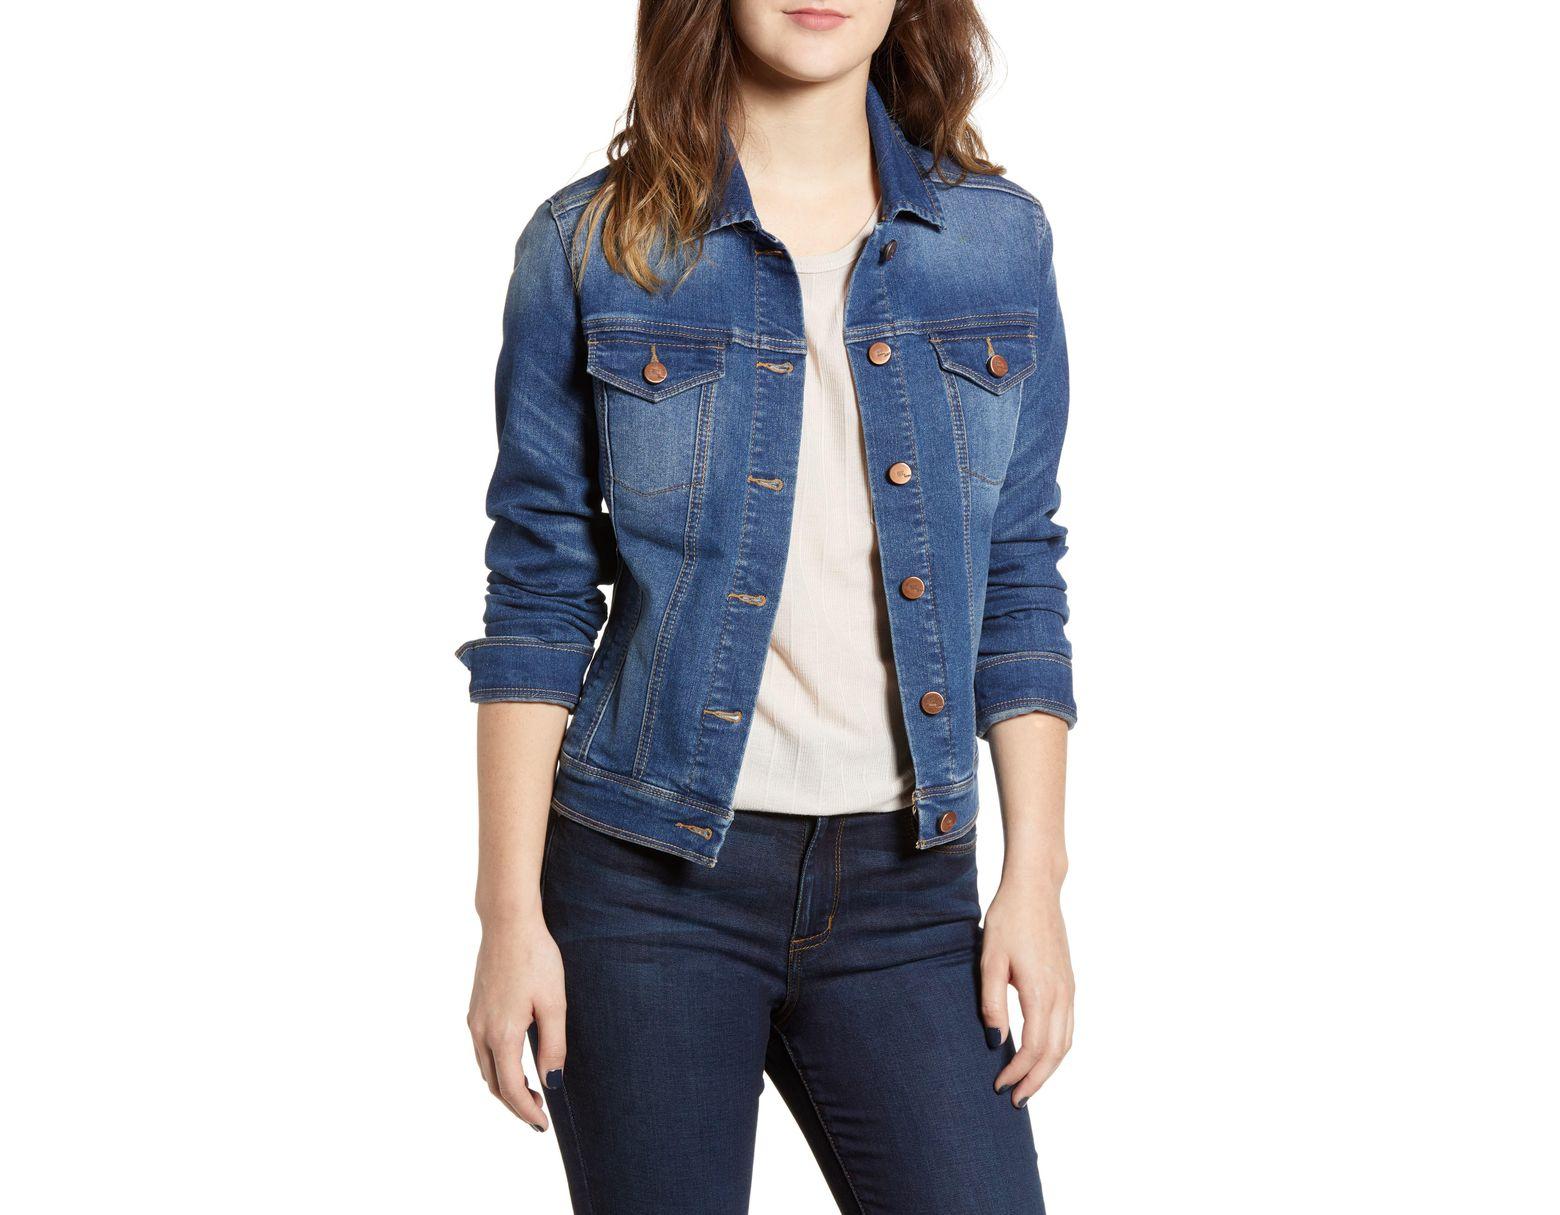 539a3414926ca 1822 Denim Heritage Denim Jacket in Blue - Lyst